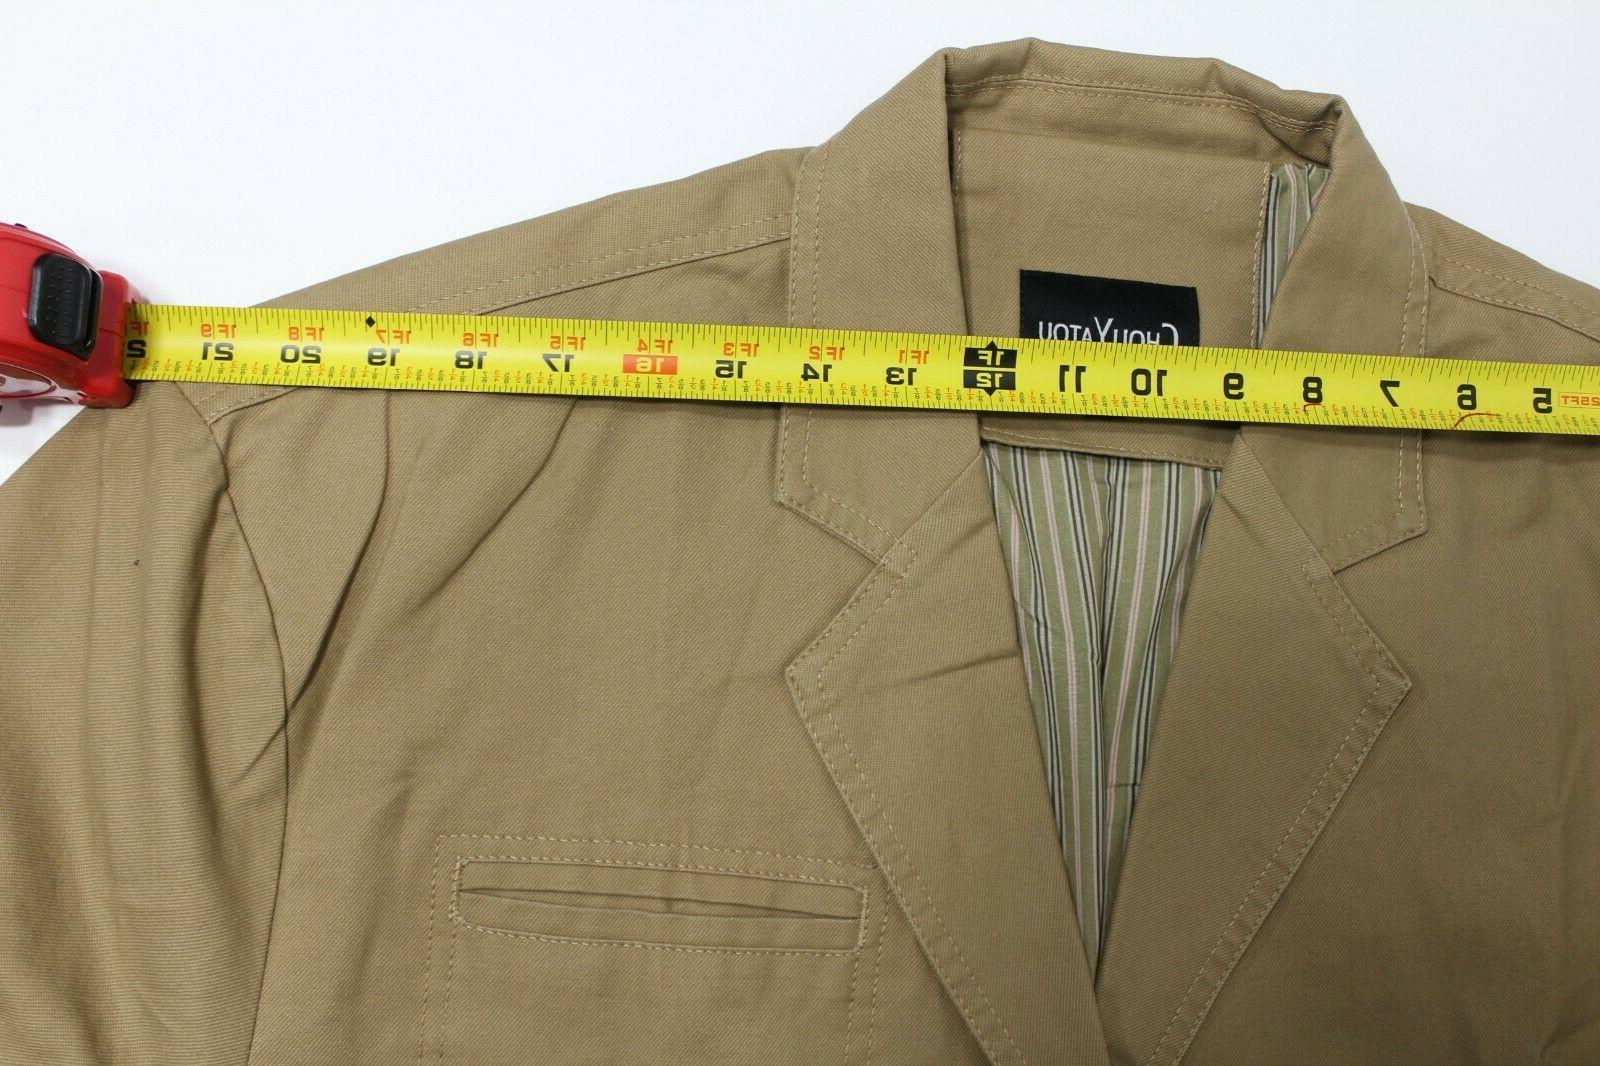 ChouYatou Jacket, Khaki, Stripe Lined, 3 Button